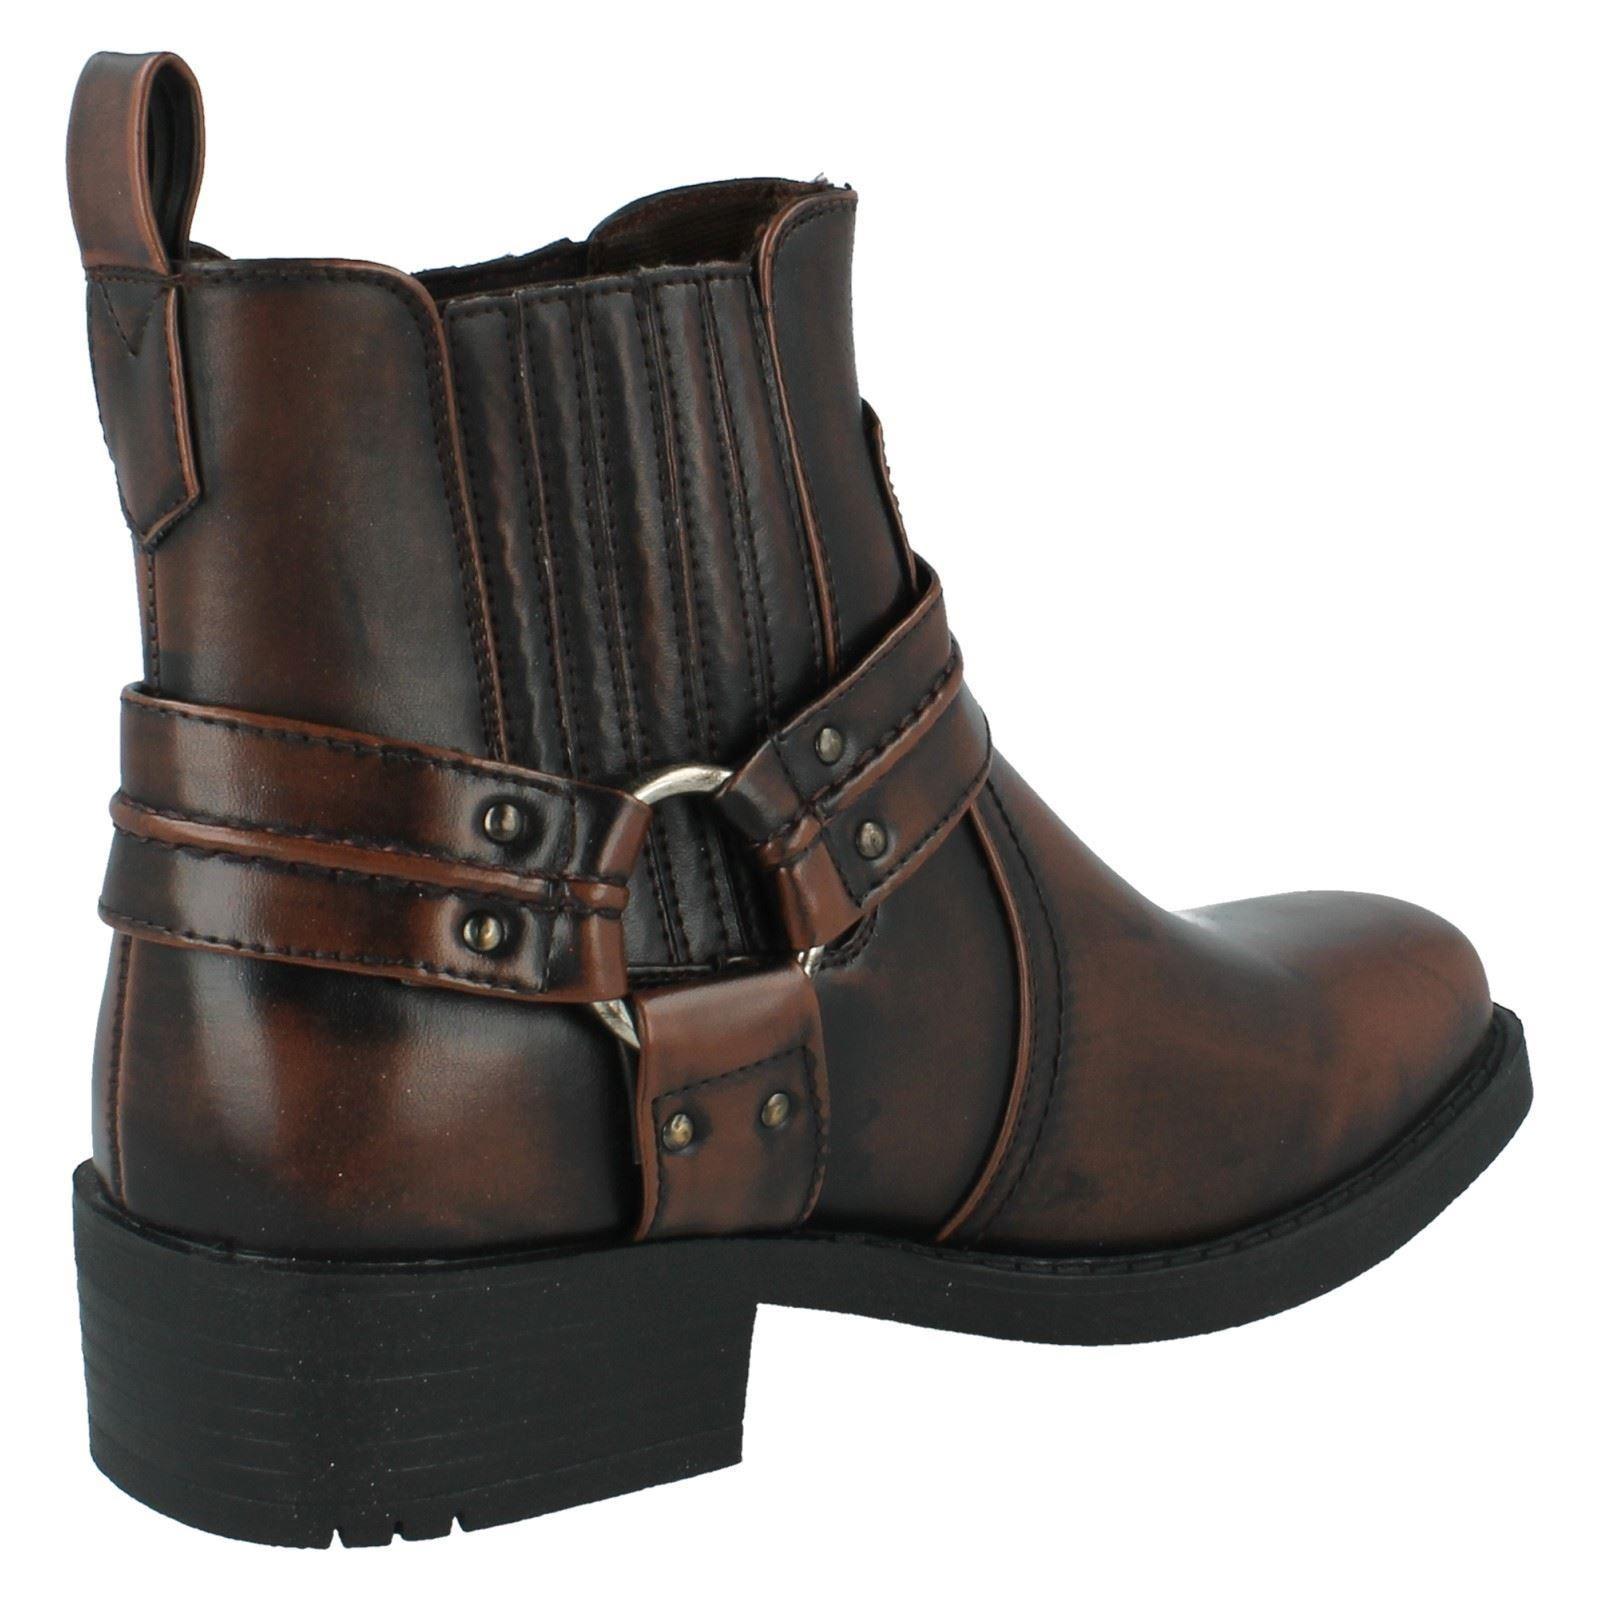 Men's Maverick Ankle Cowboy Boots Style - A3027 | eBay